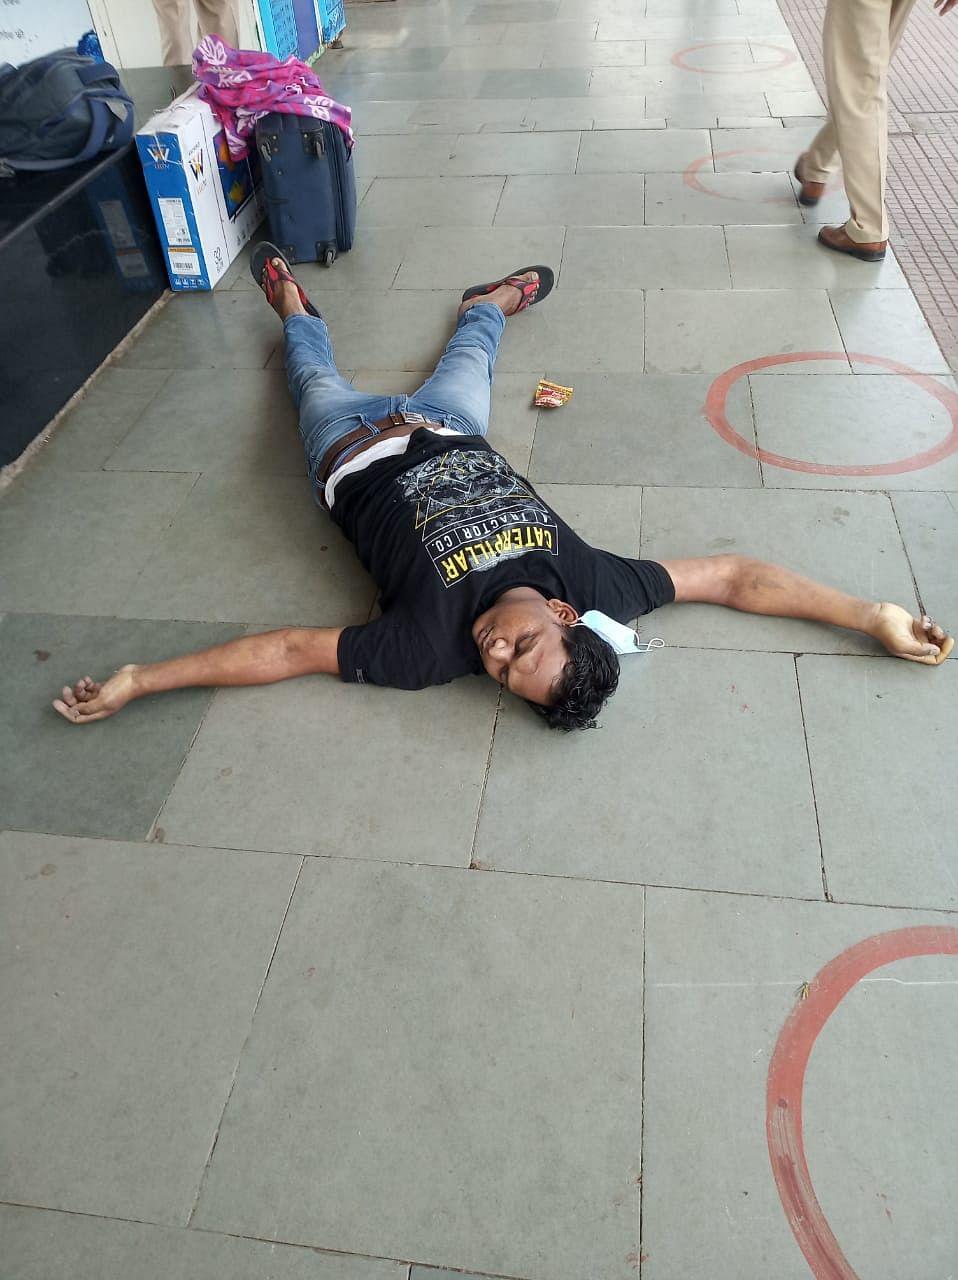 नई दिल्ली ट्रेन से रांची पहुंचा एक यात्री, स्टेशन पर  हुई मौत